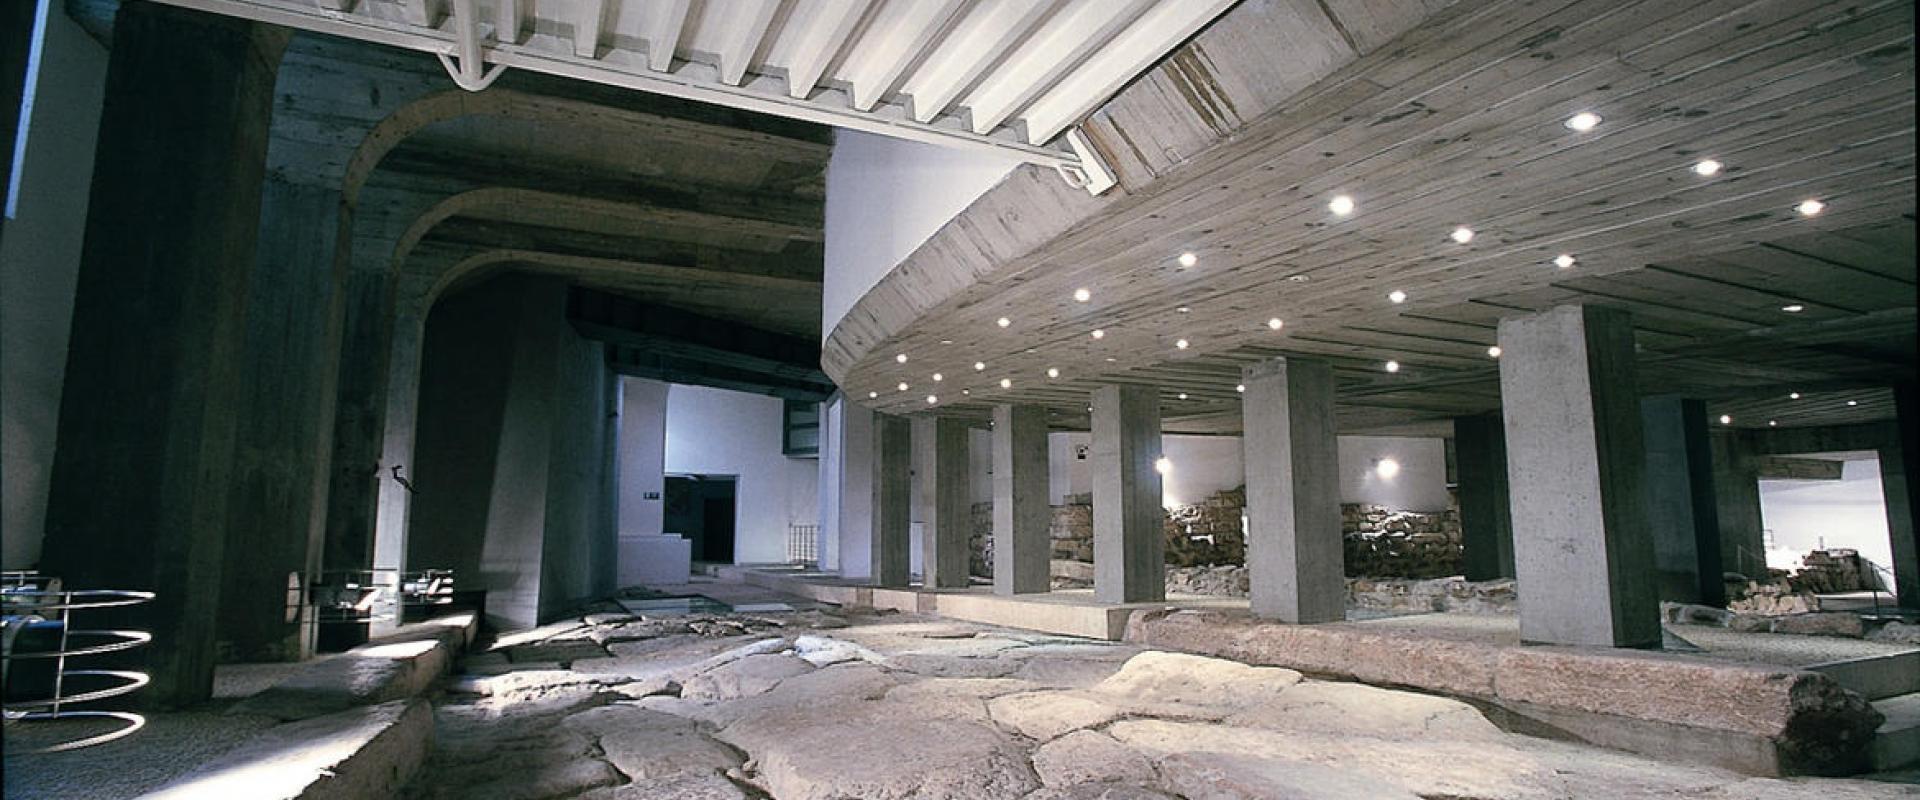 visit of the underground Tridentum